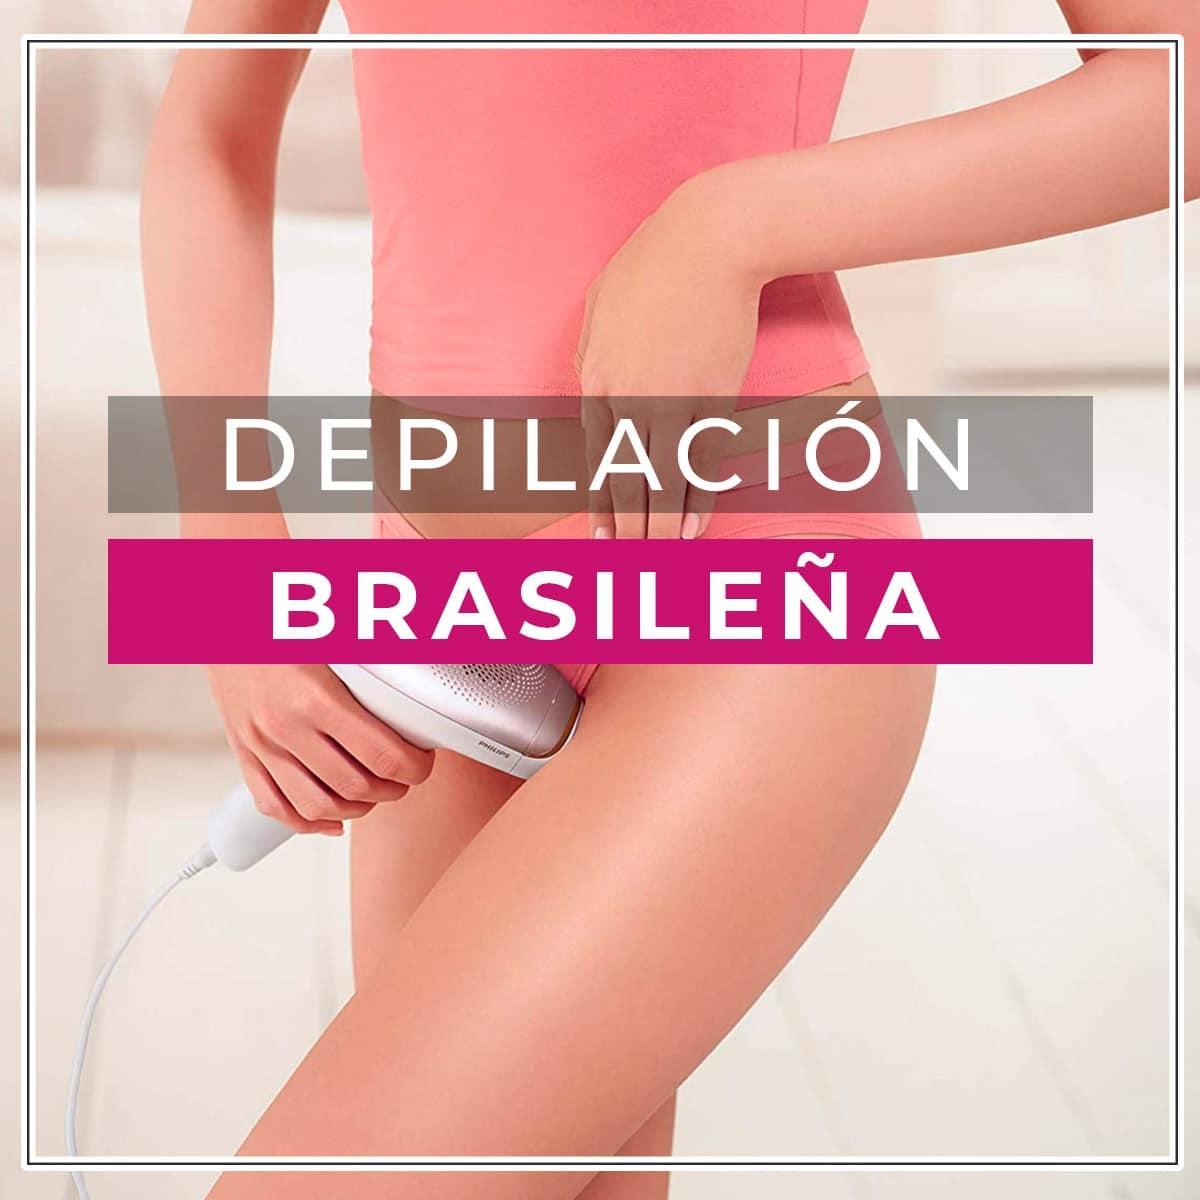 depilacion brasilena